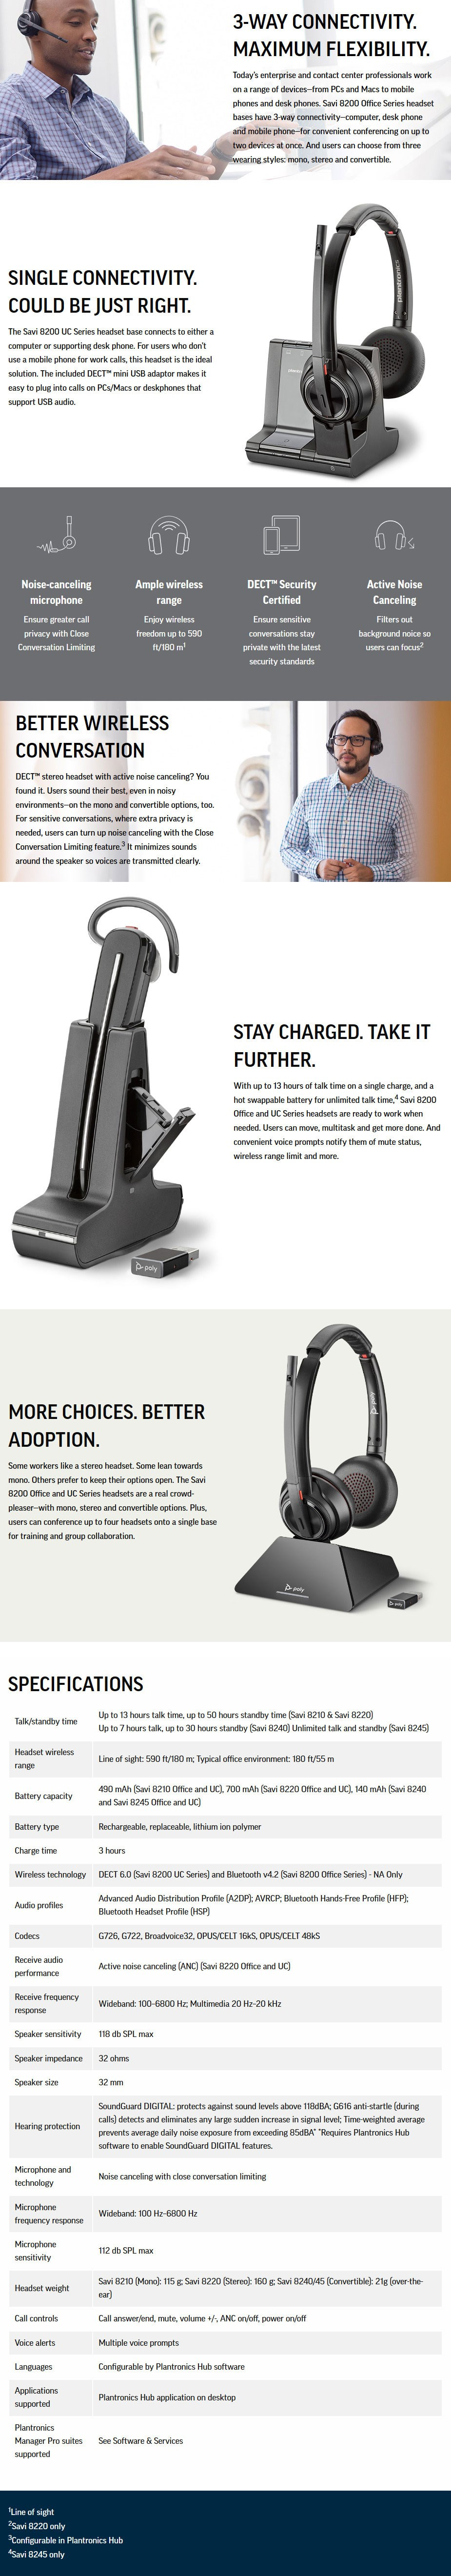 plantronics-savi-8240-uc-convertible-wireless-dect-headset-system-ac31081-1-3-.jpg